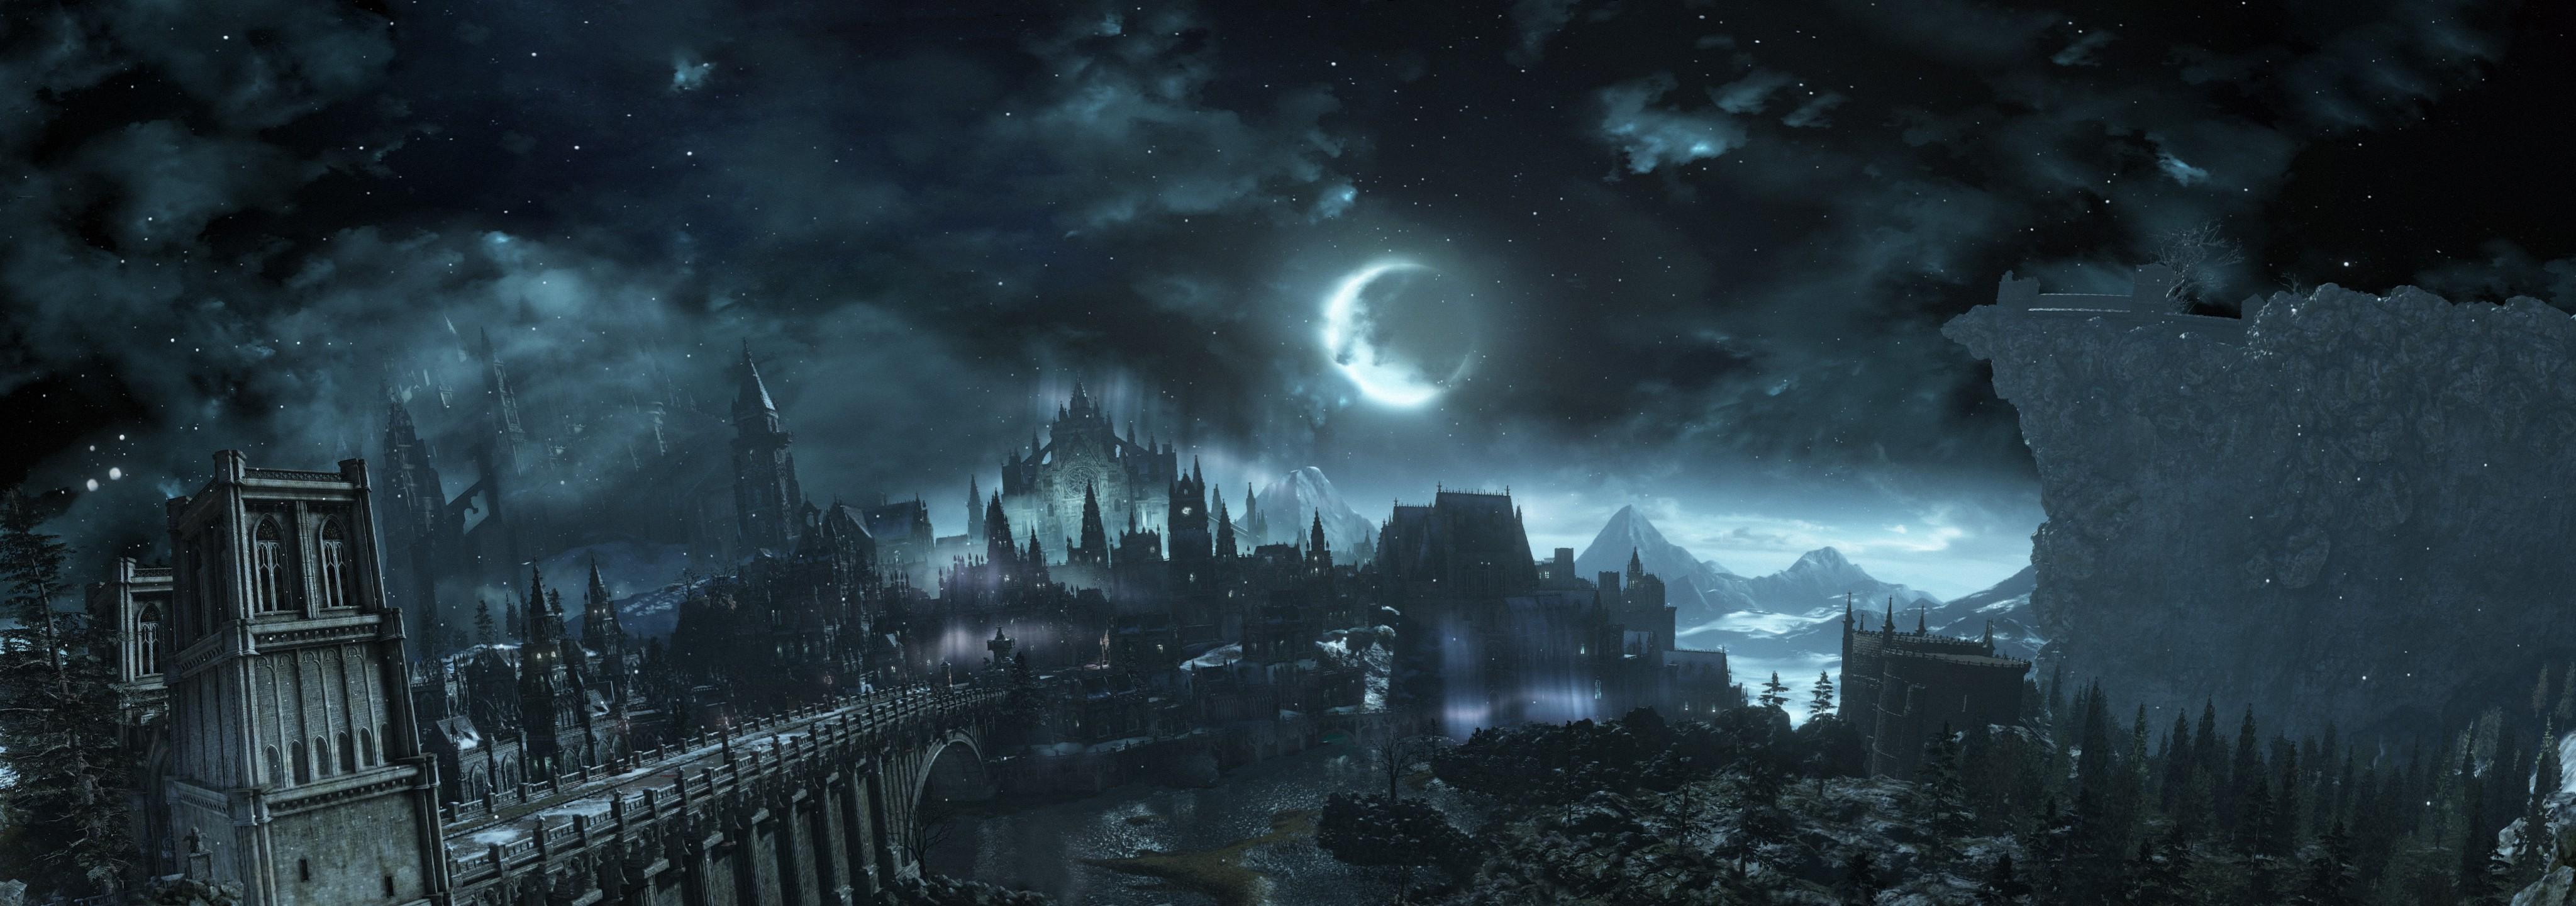 Dark Souls Iii Hd Wallpaper Background Image 4096x1440 Id